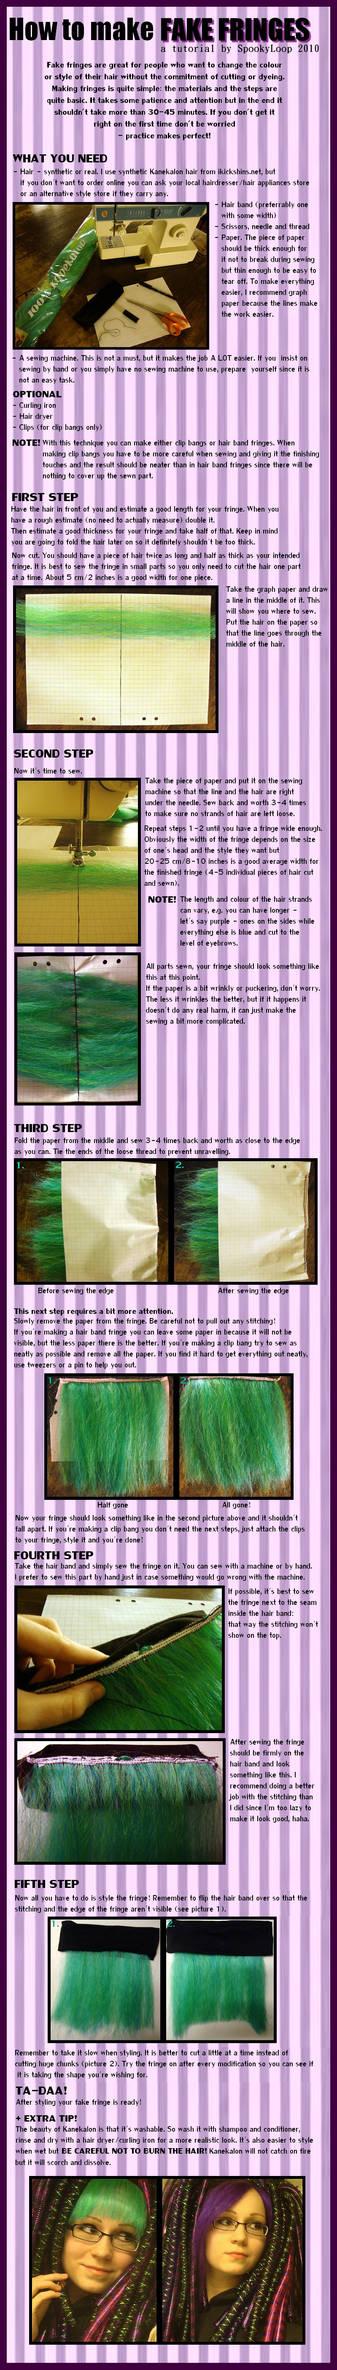 How to Make Fake Fringes